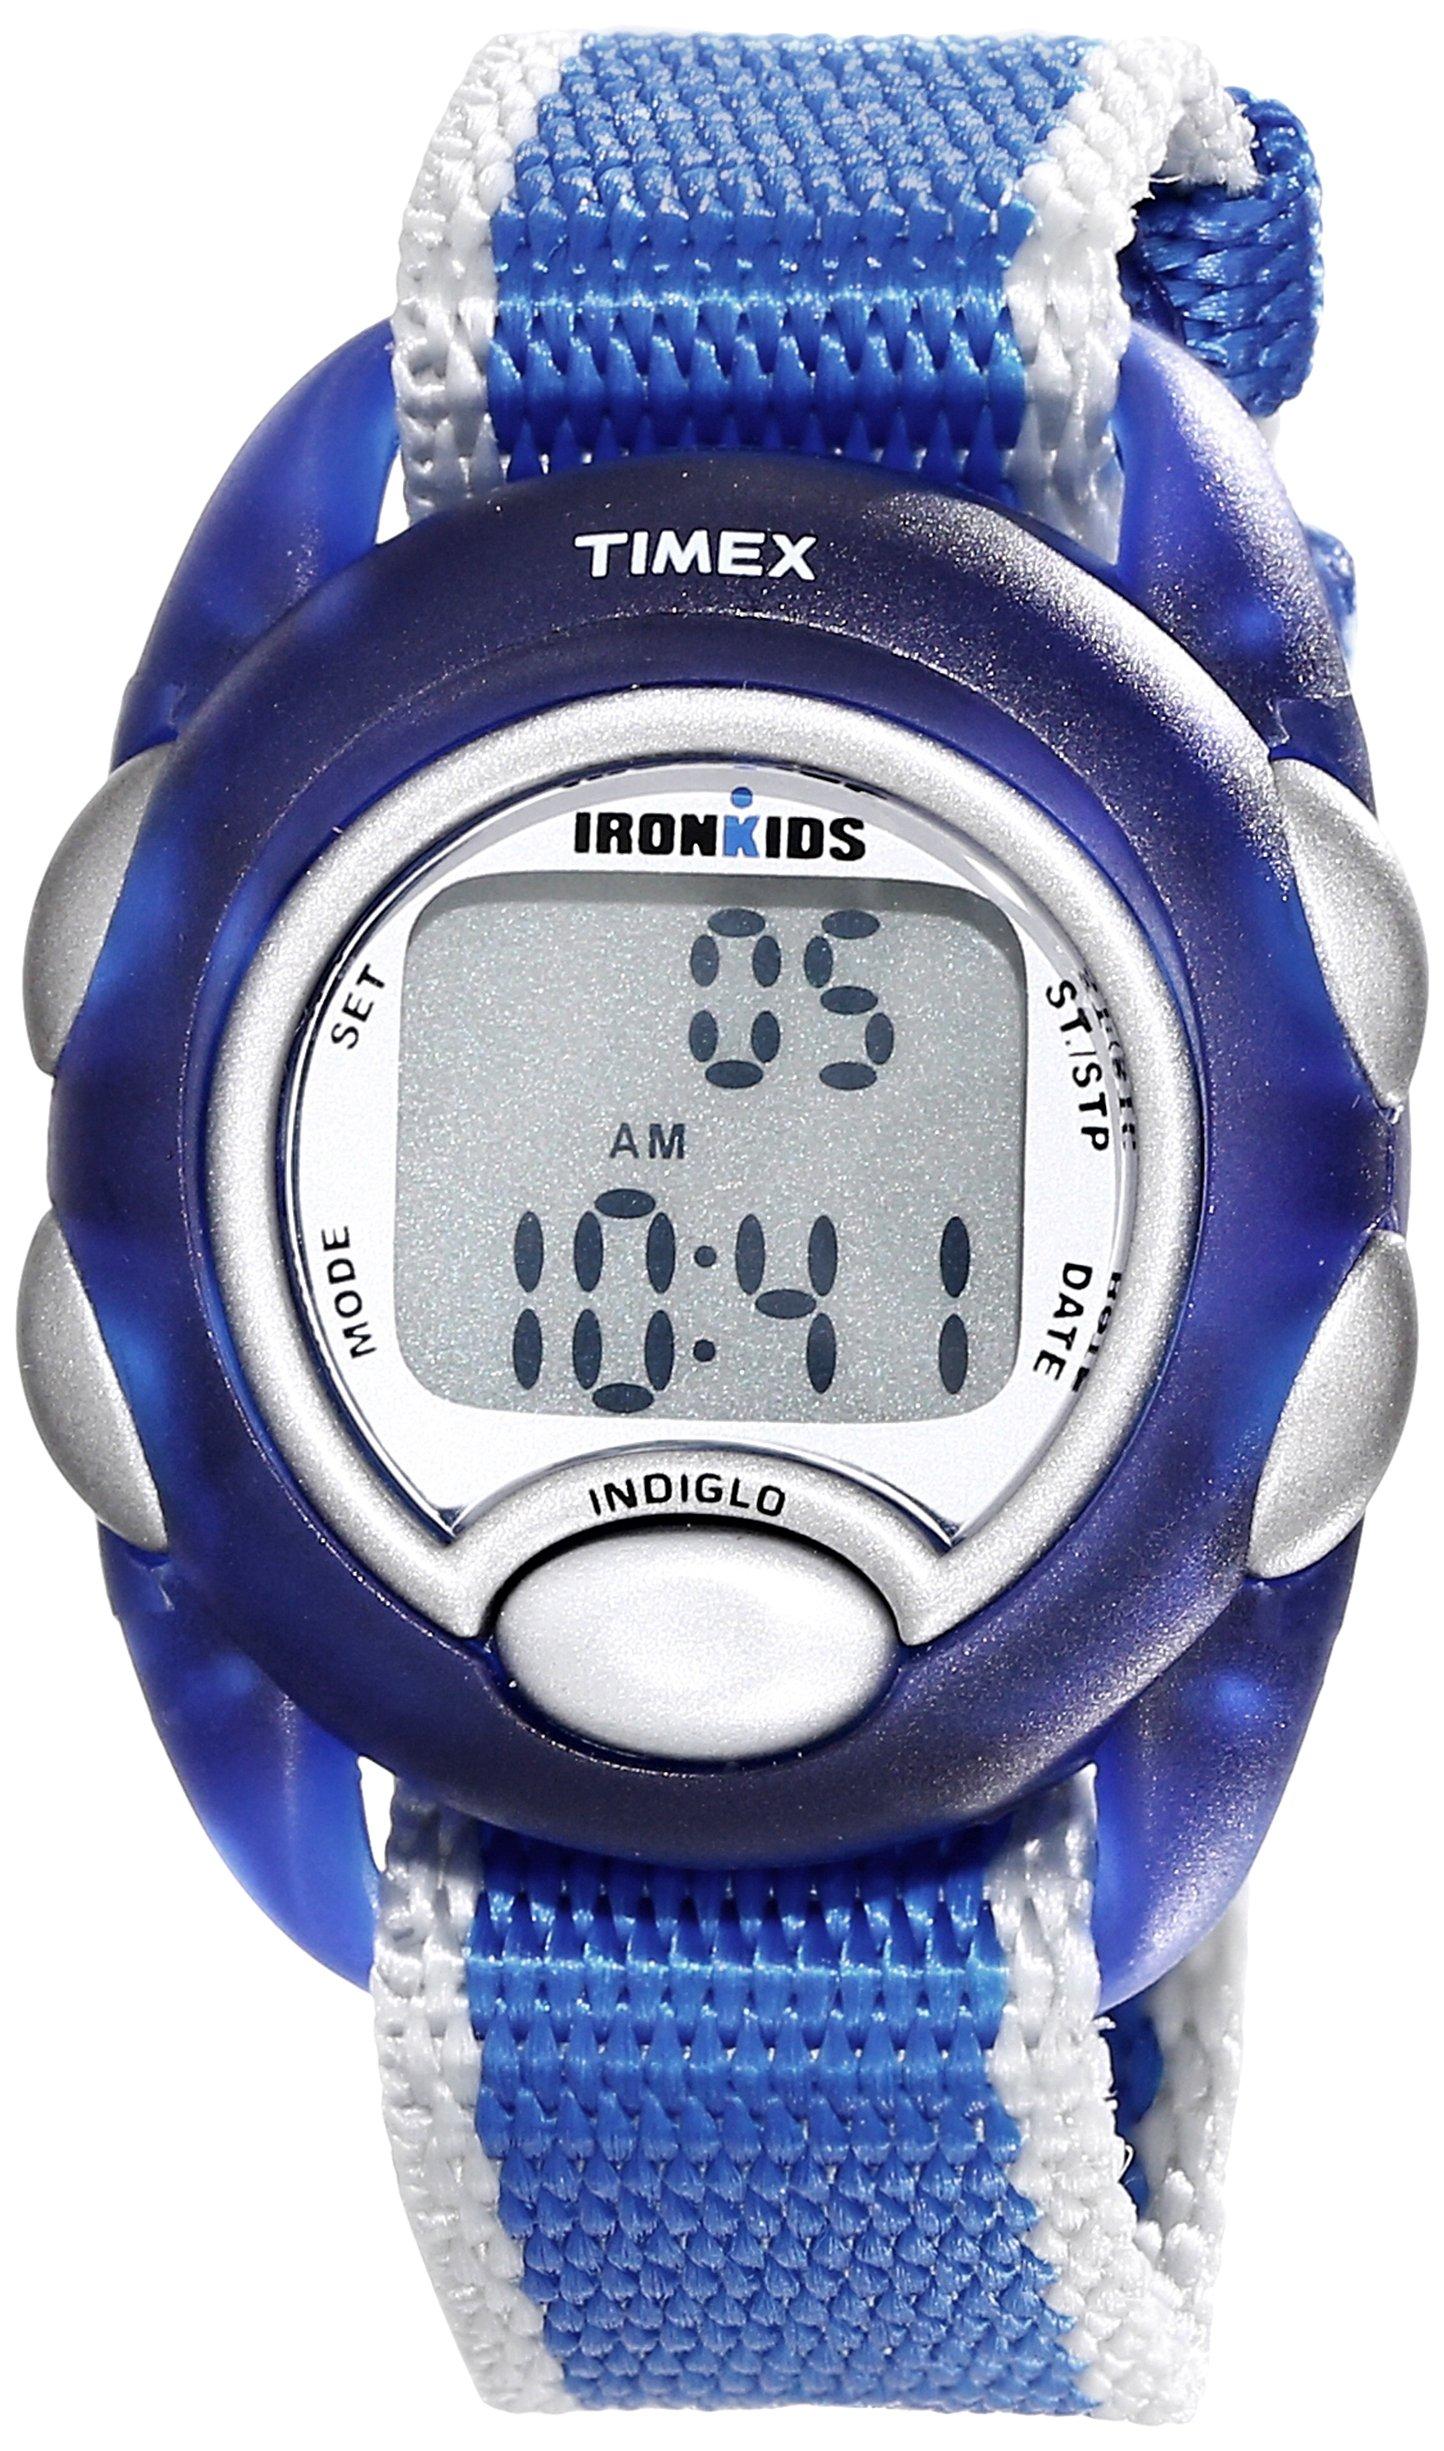 Timex Kids' T7B9829J IronKids Translucent Blue Sport Watch